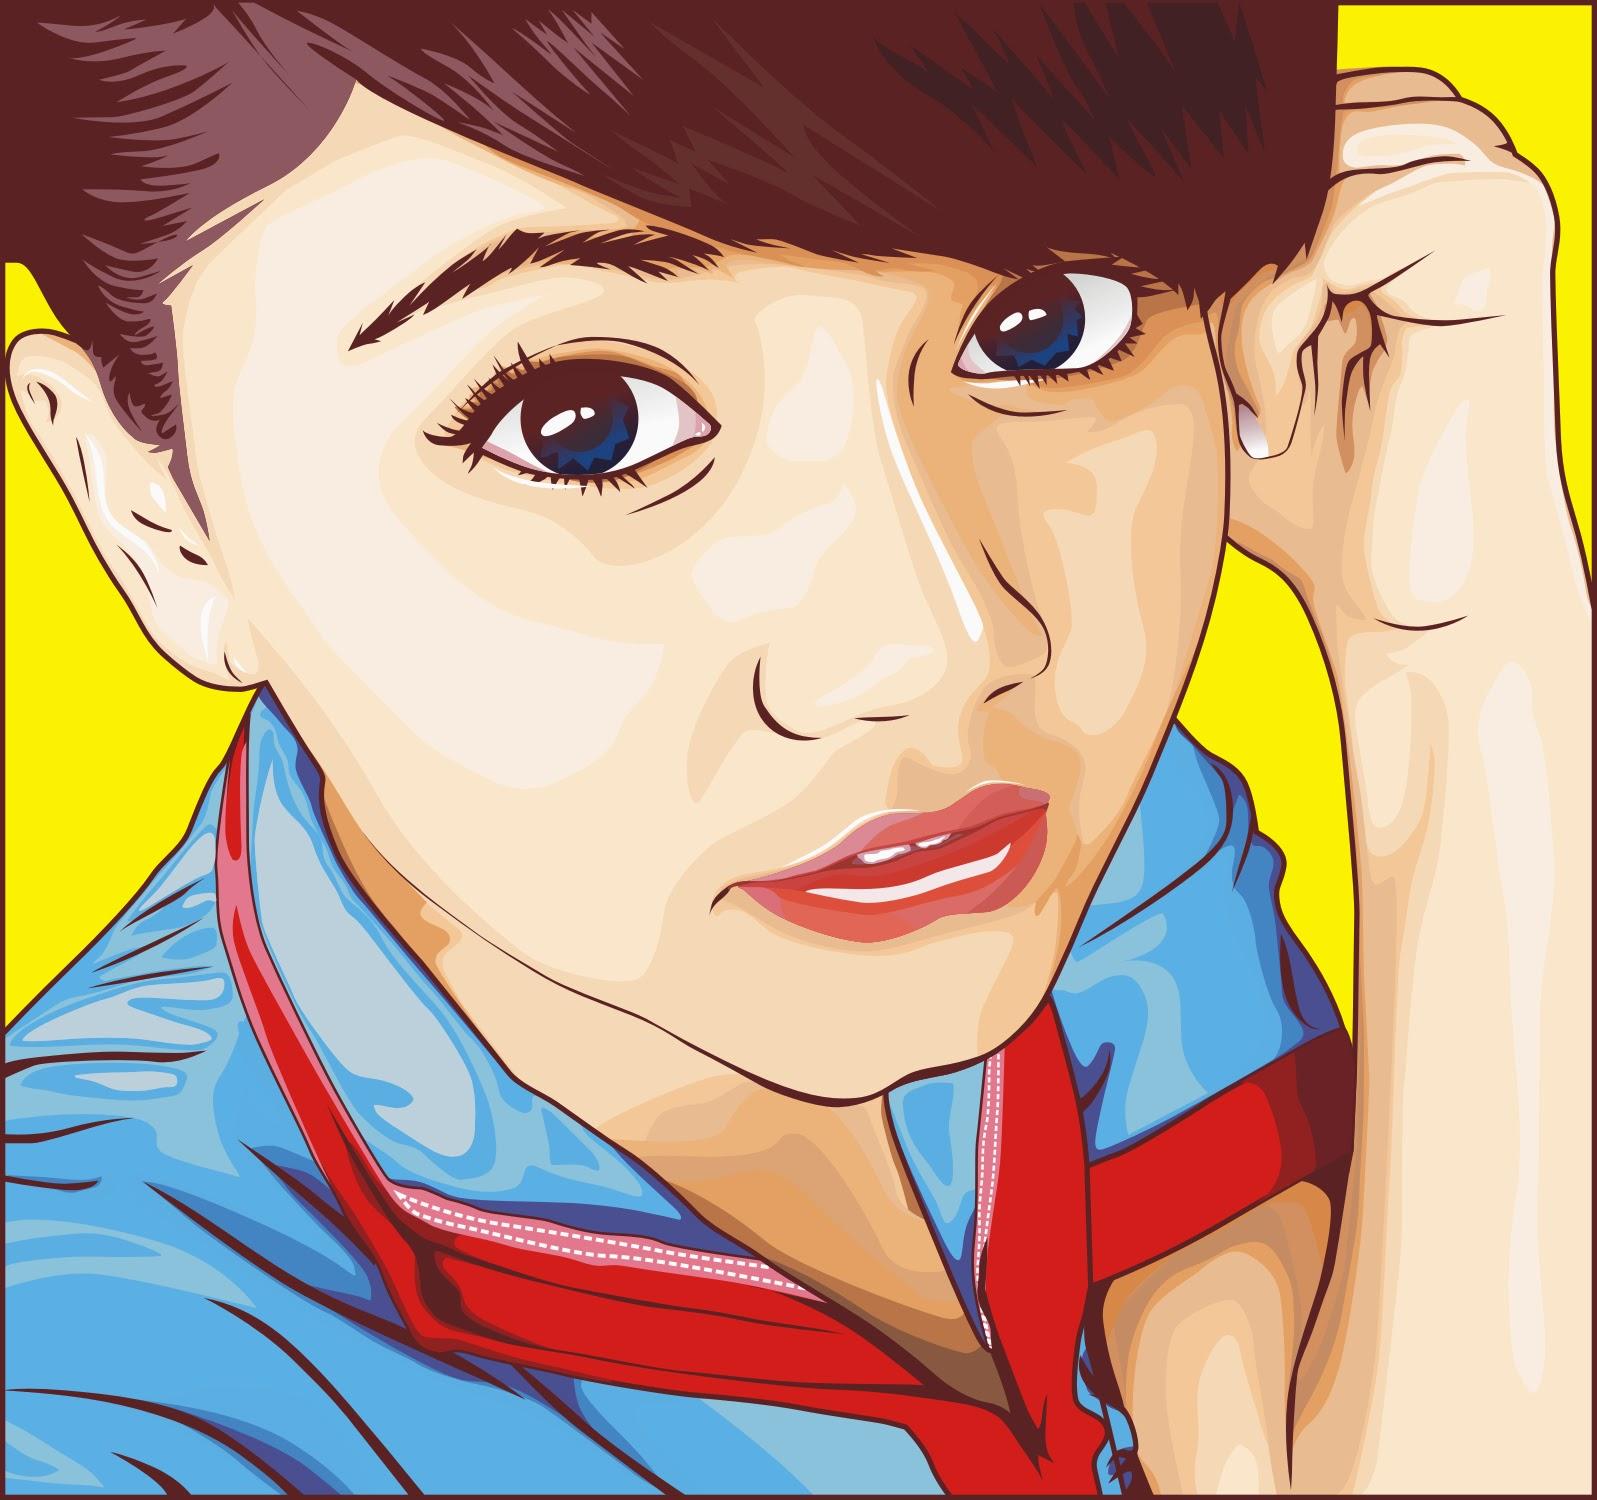 Gambar Kartun Hijab Jepang Keren Bestkartun